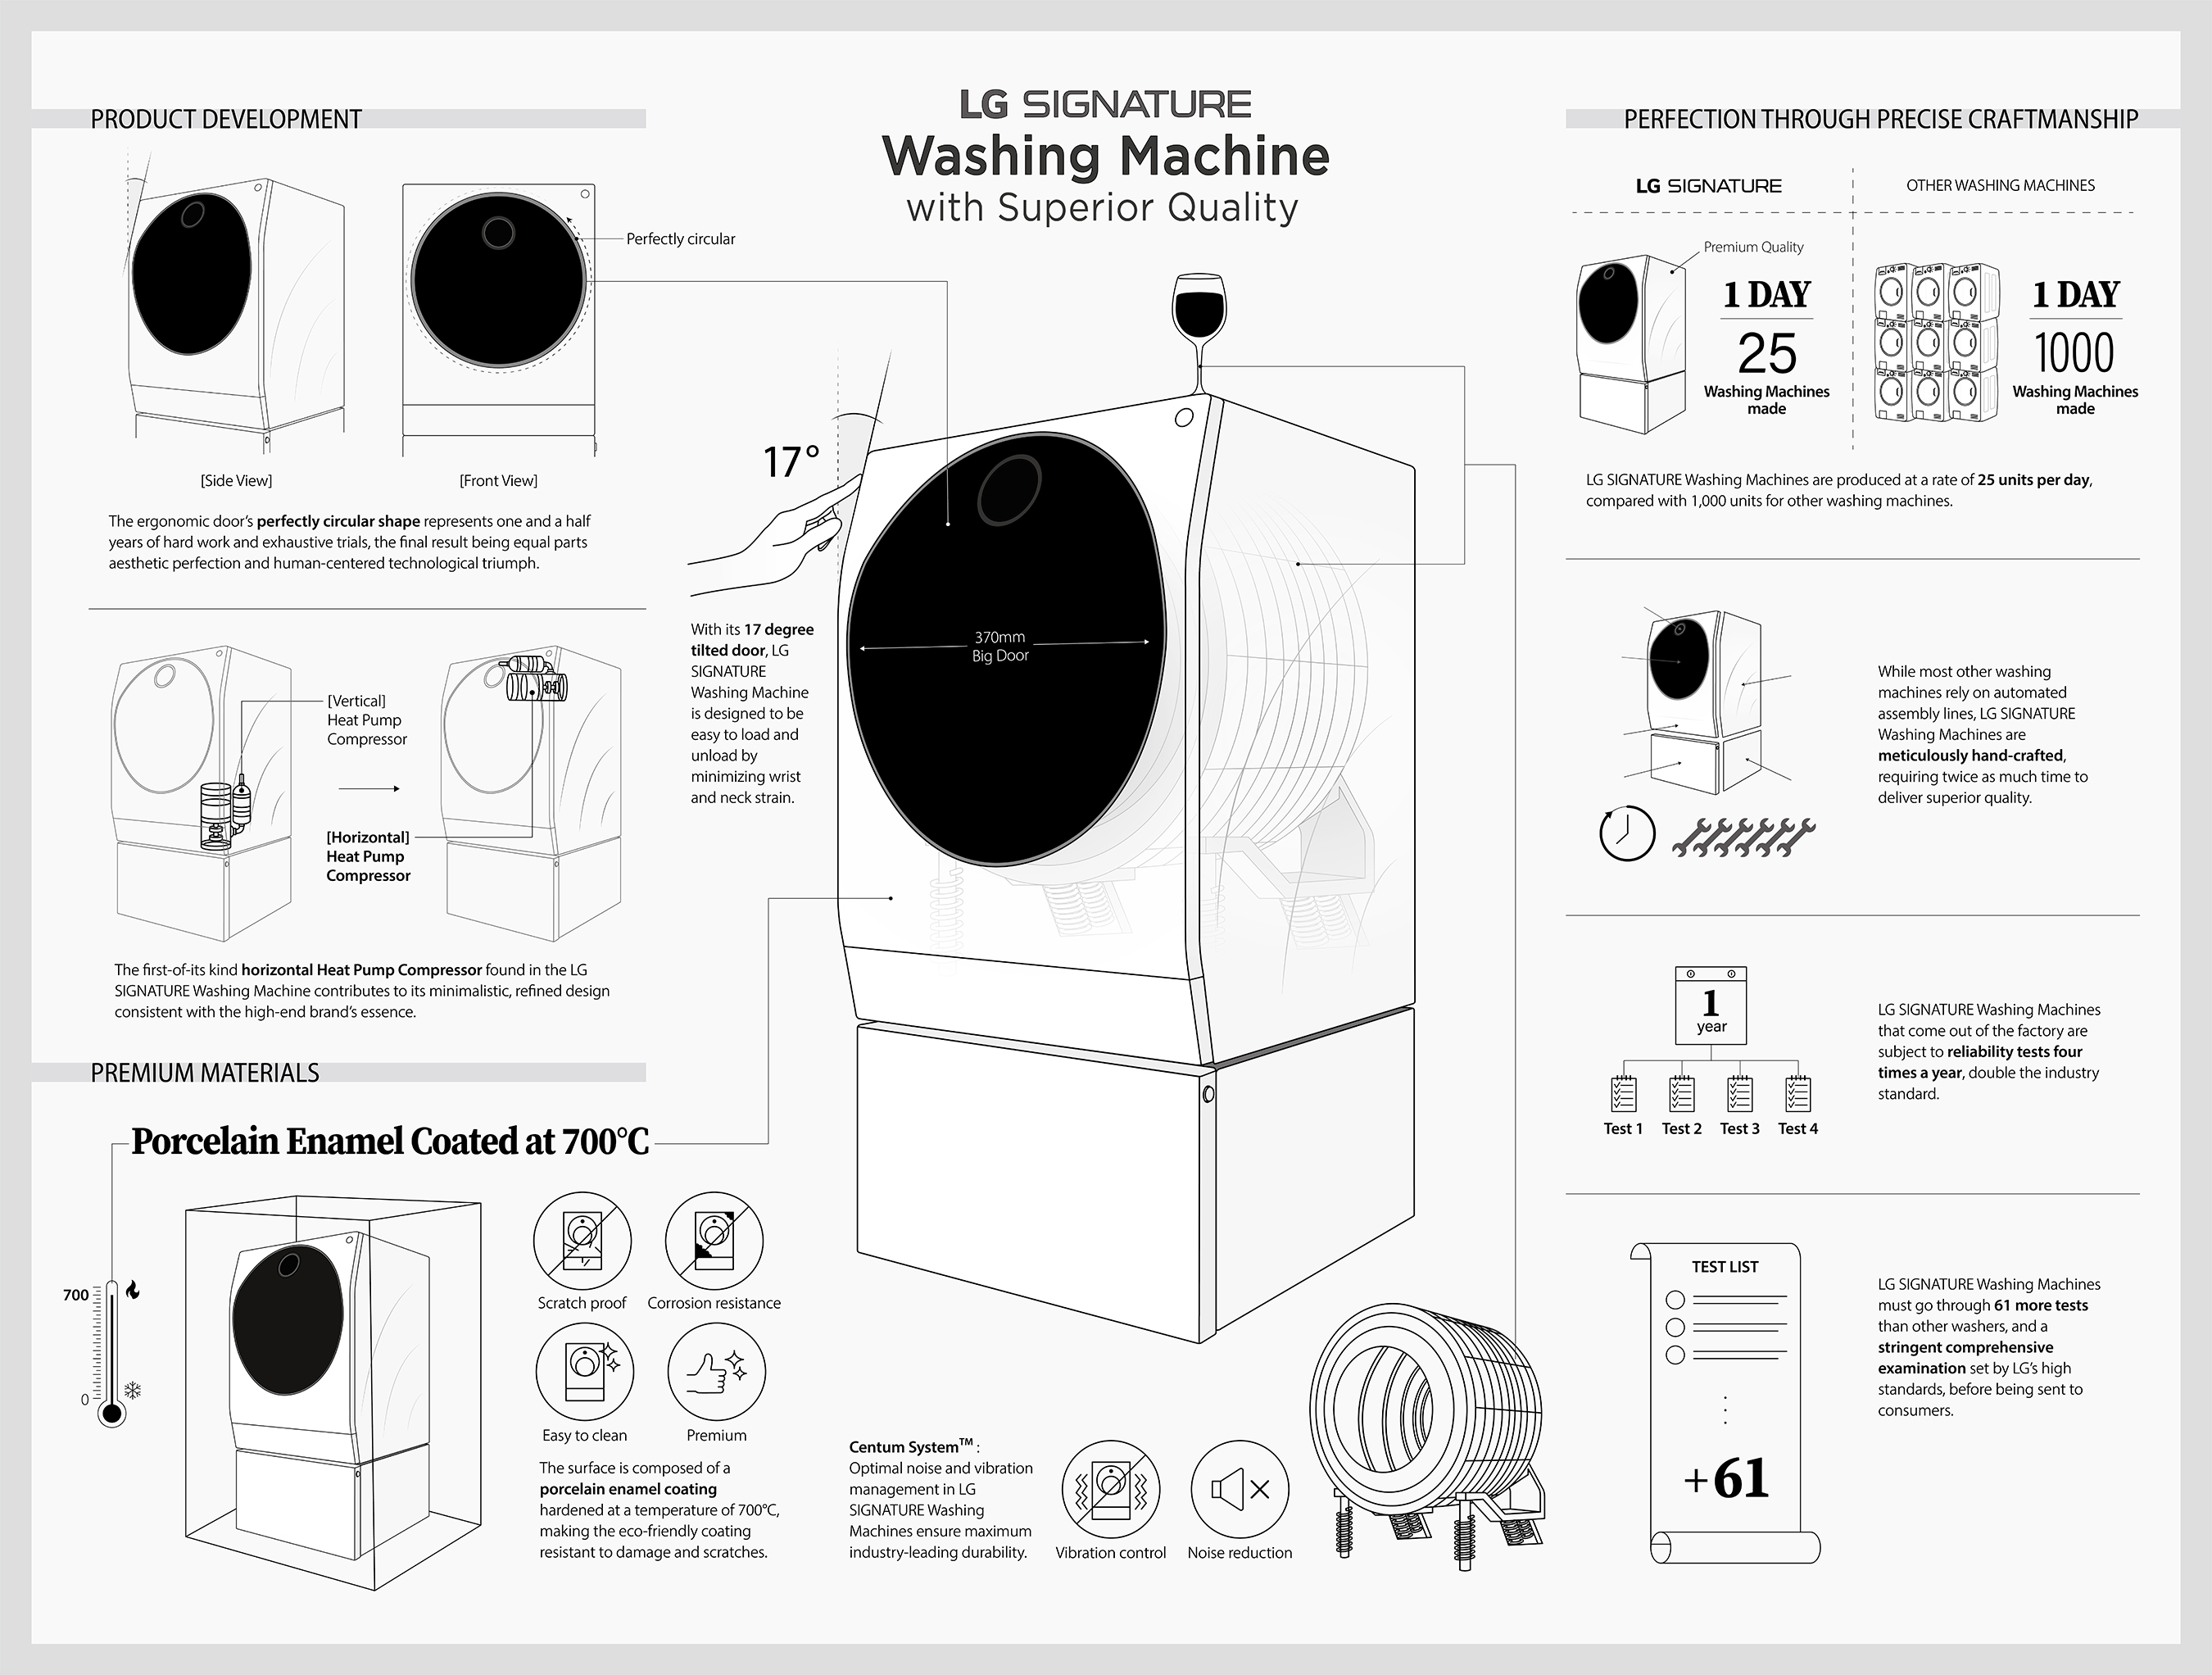 LG SIGNATURE Washing Machine with superior quality